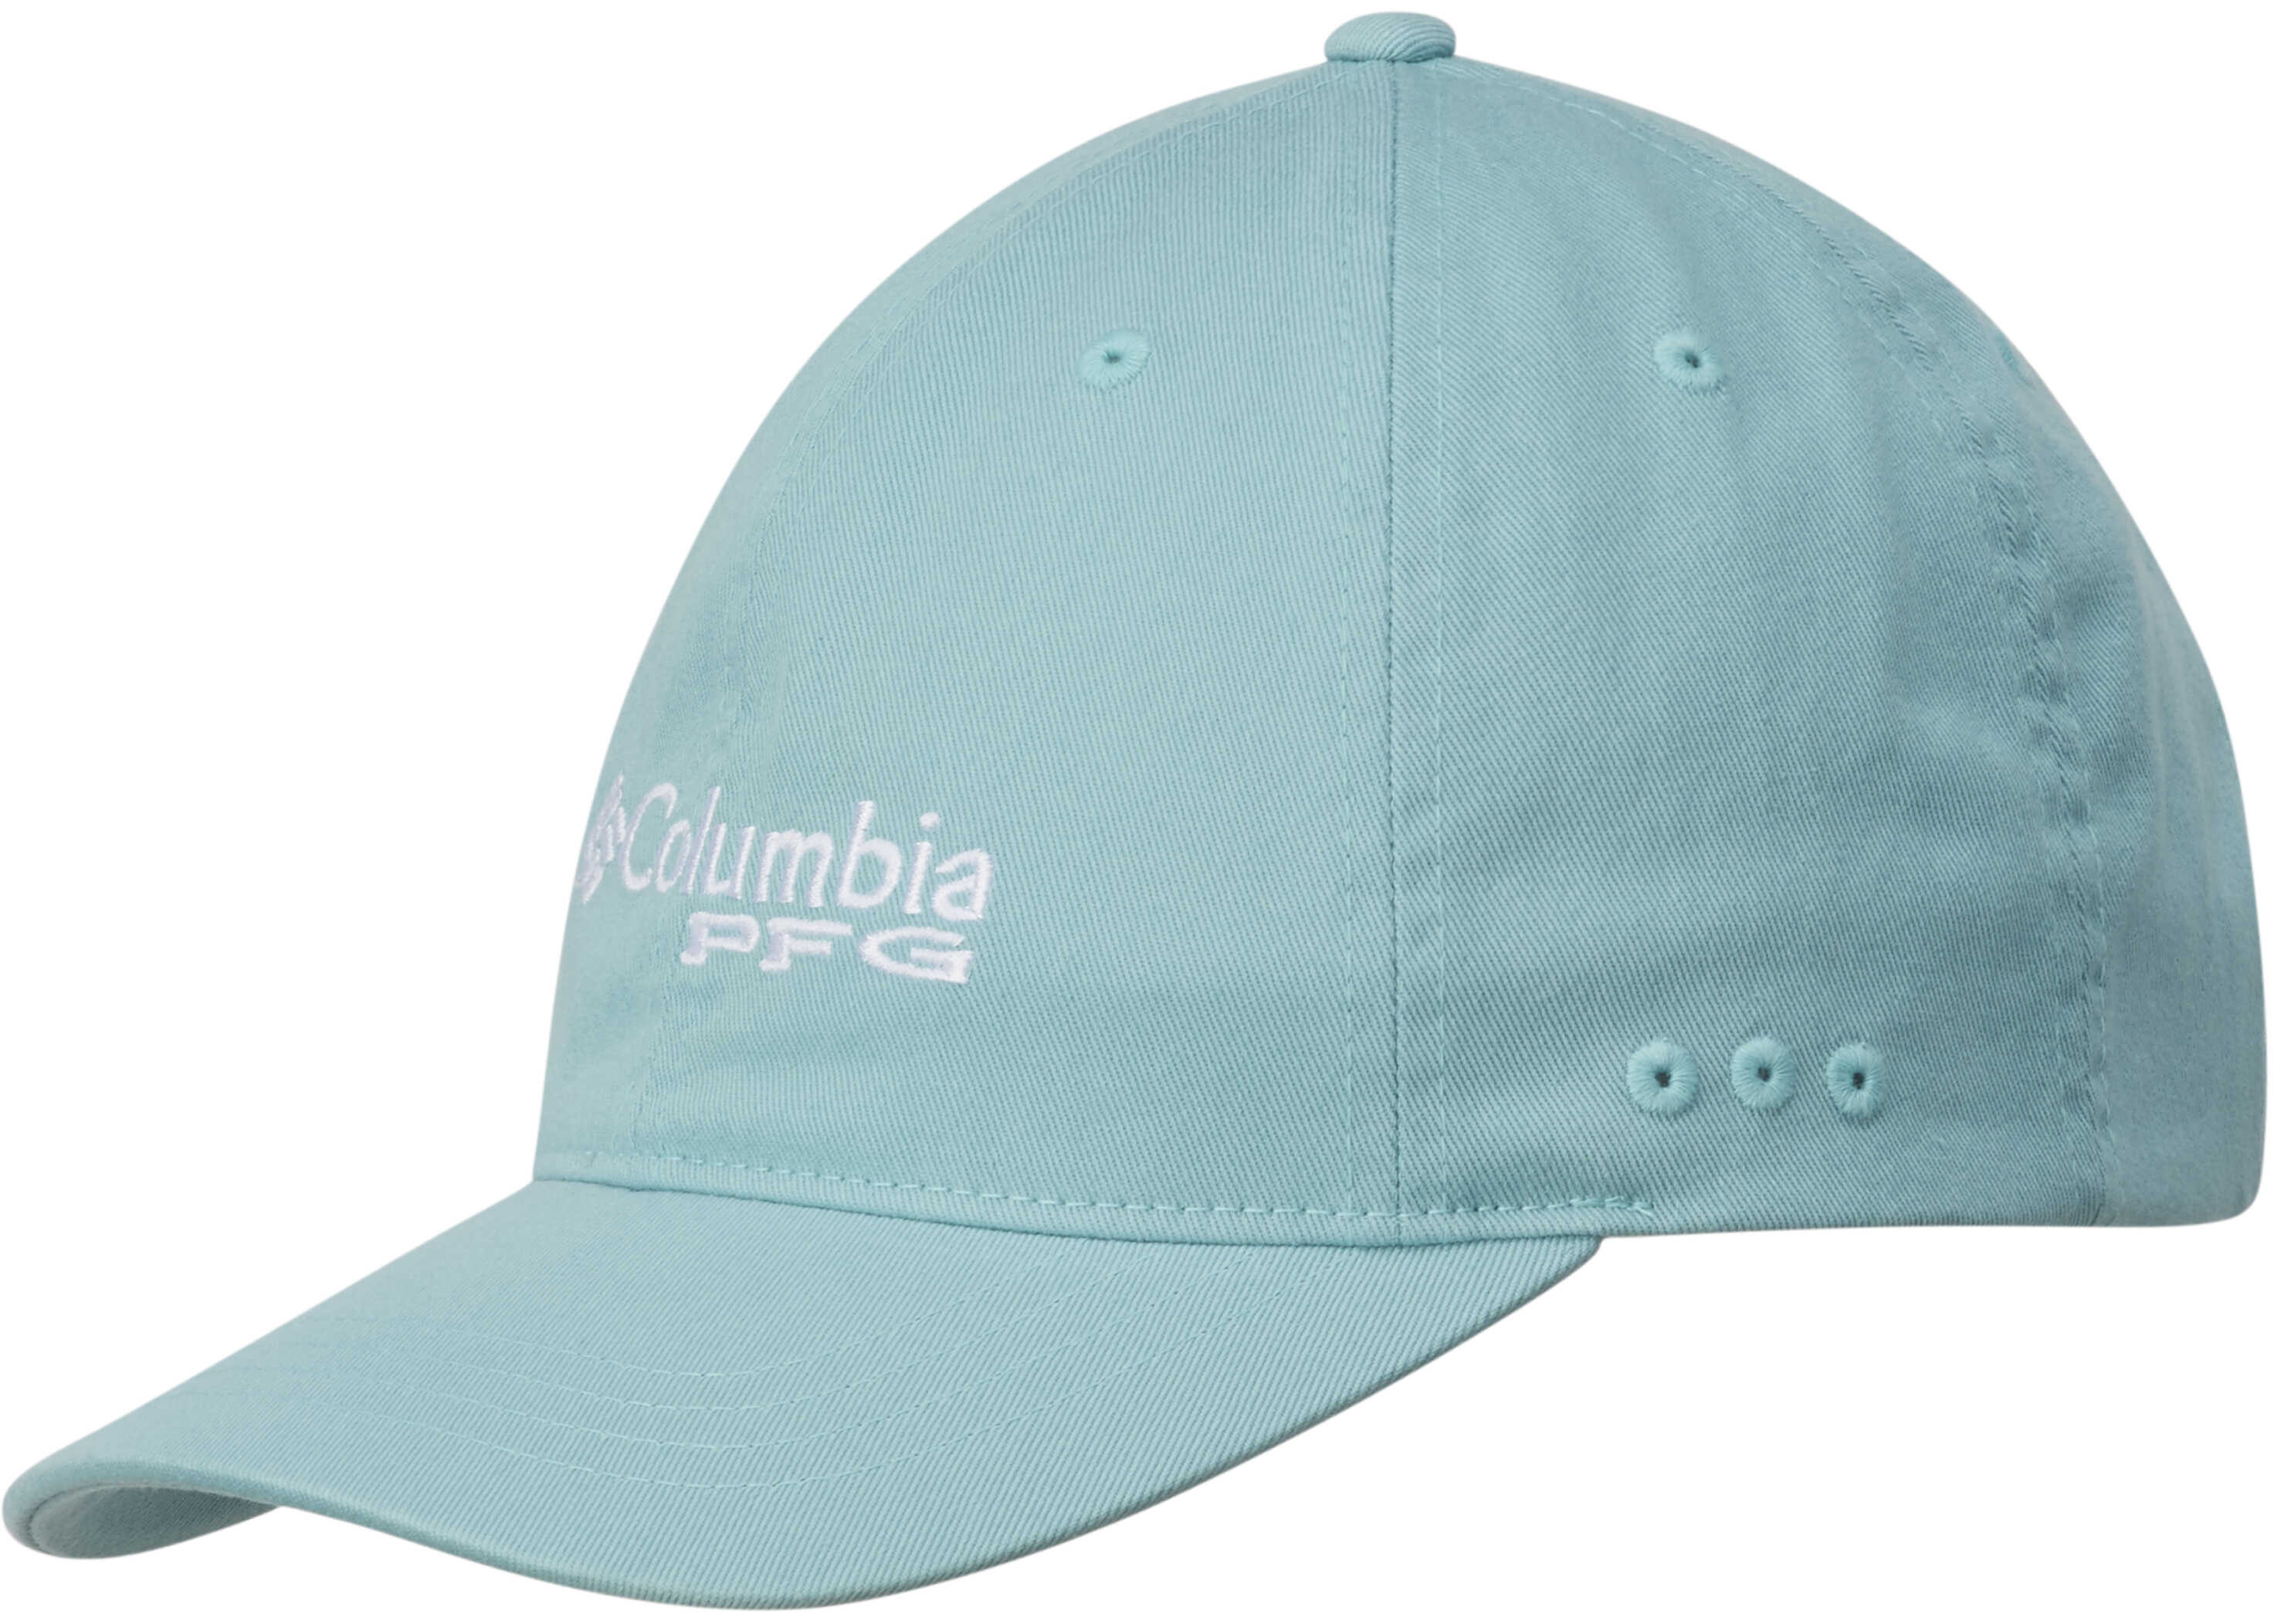 Columbia PFG Bonehead ™ Ballcap-Jude Lime Moxie, White